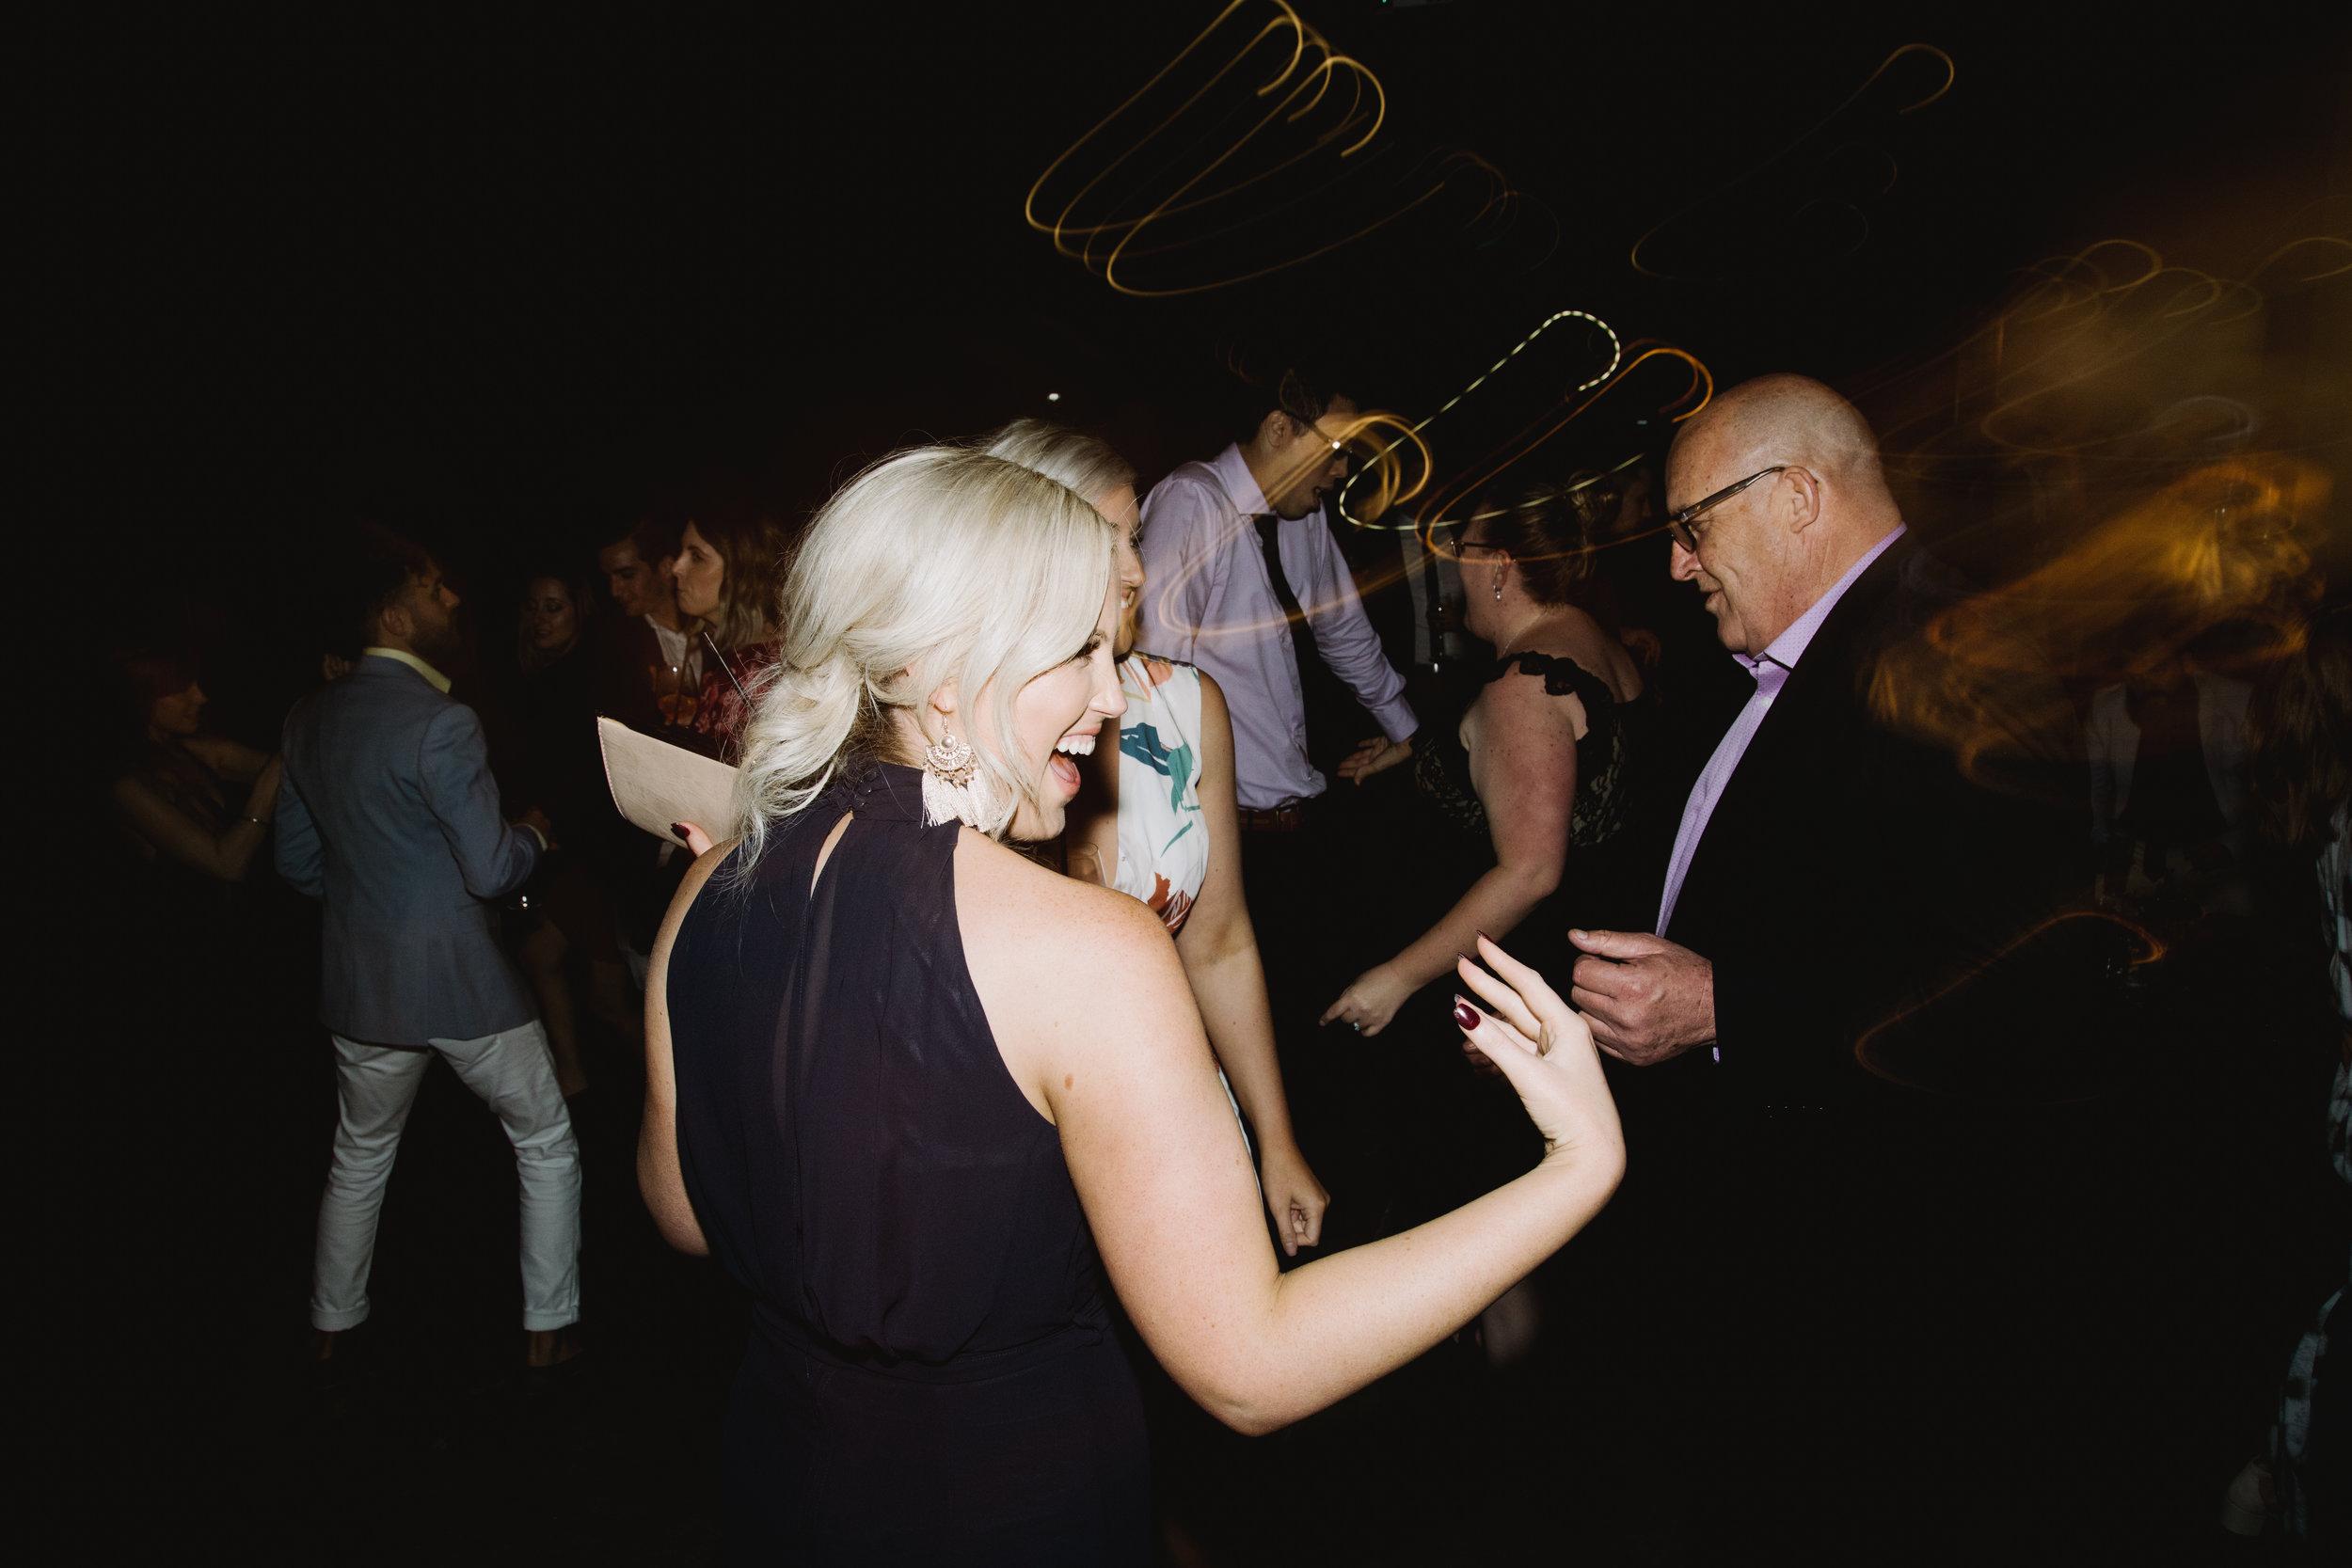 refinery-brisbane-wedding-reception-7.jpg